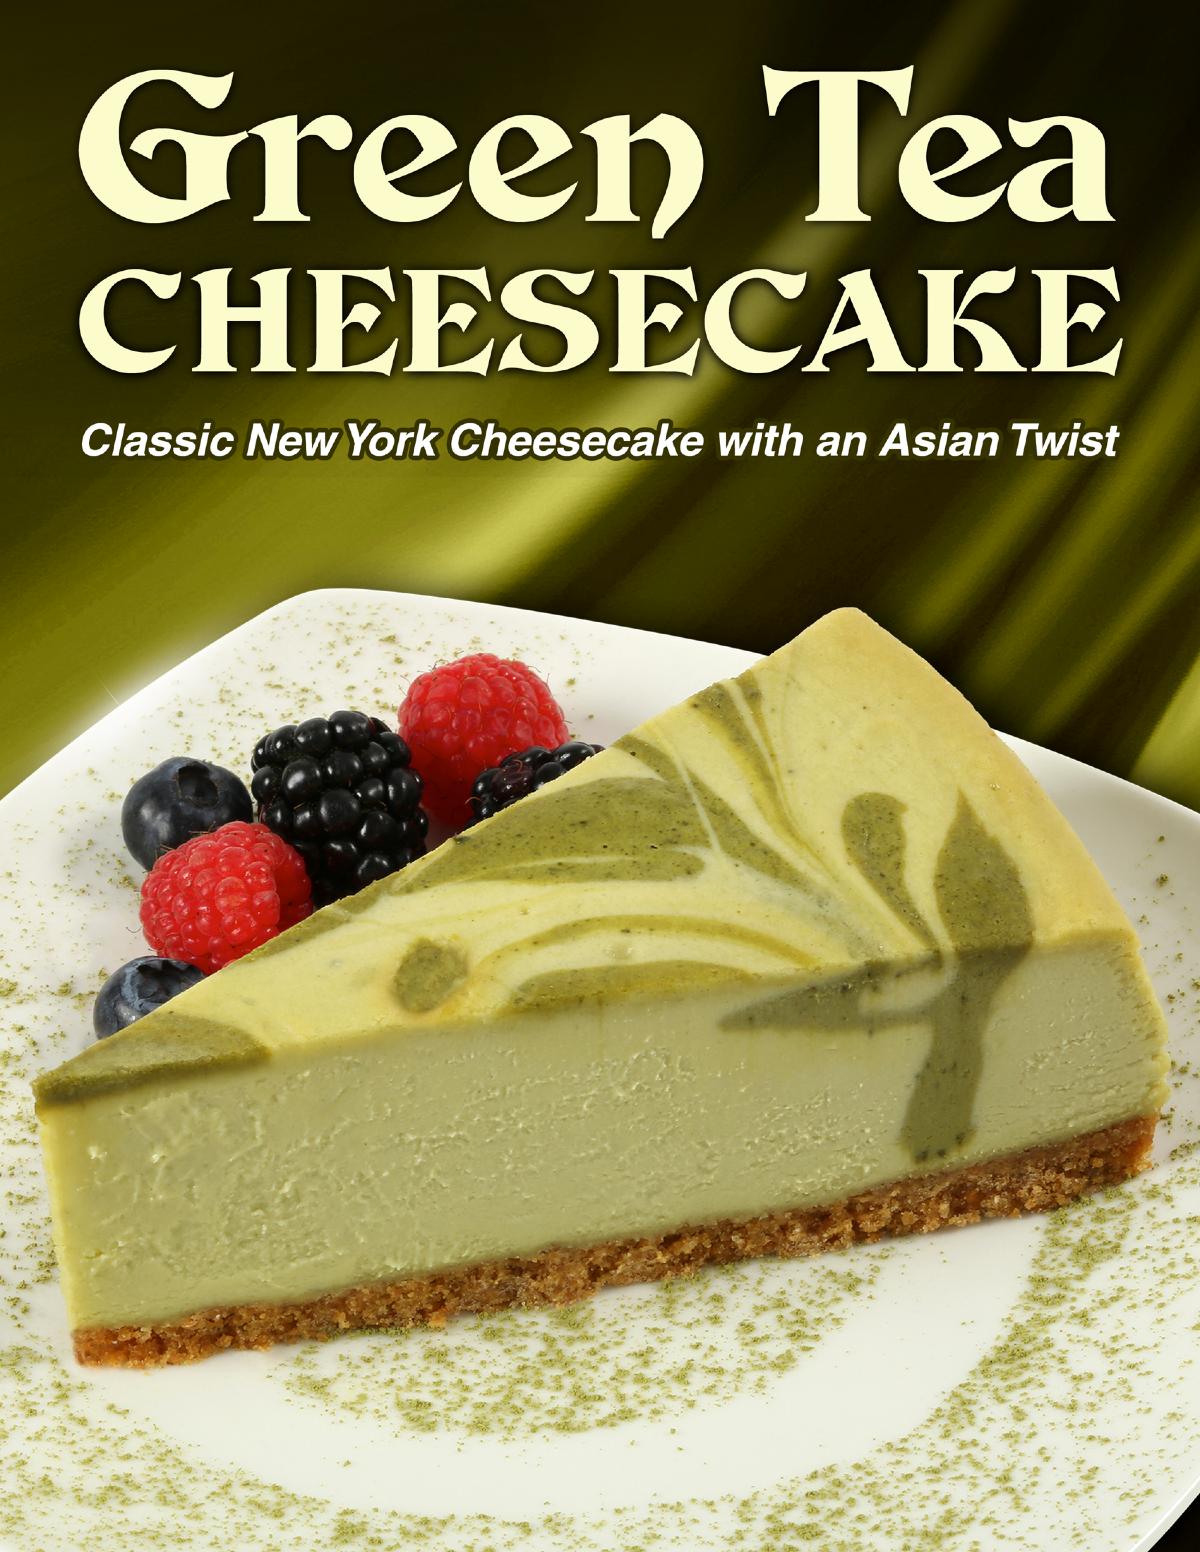 Green Tea Cheesecake Flyer